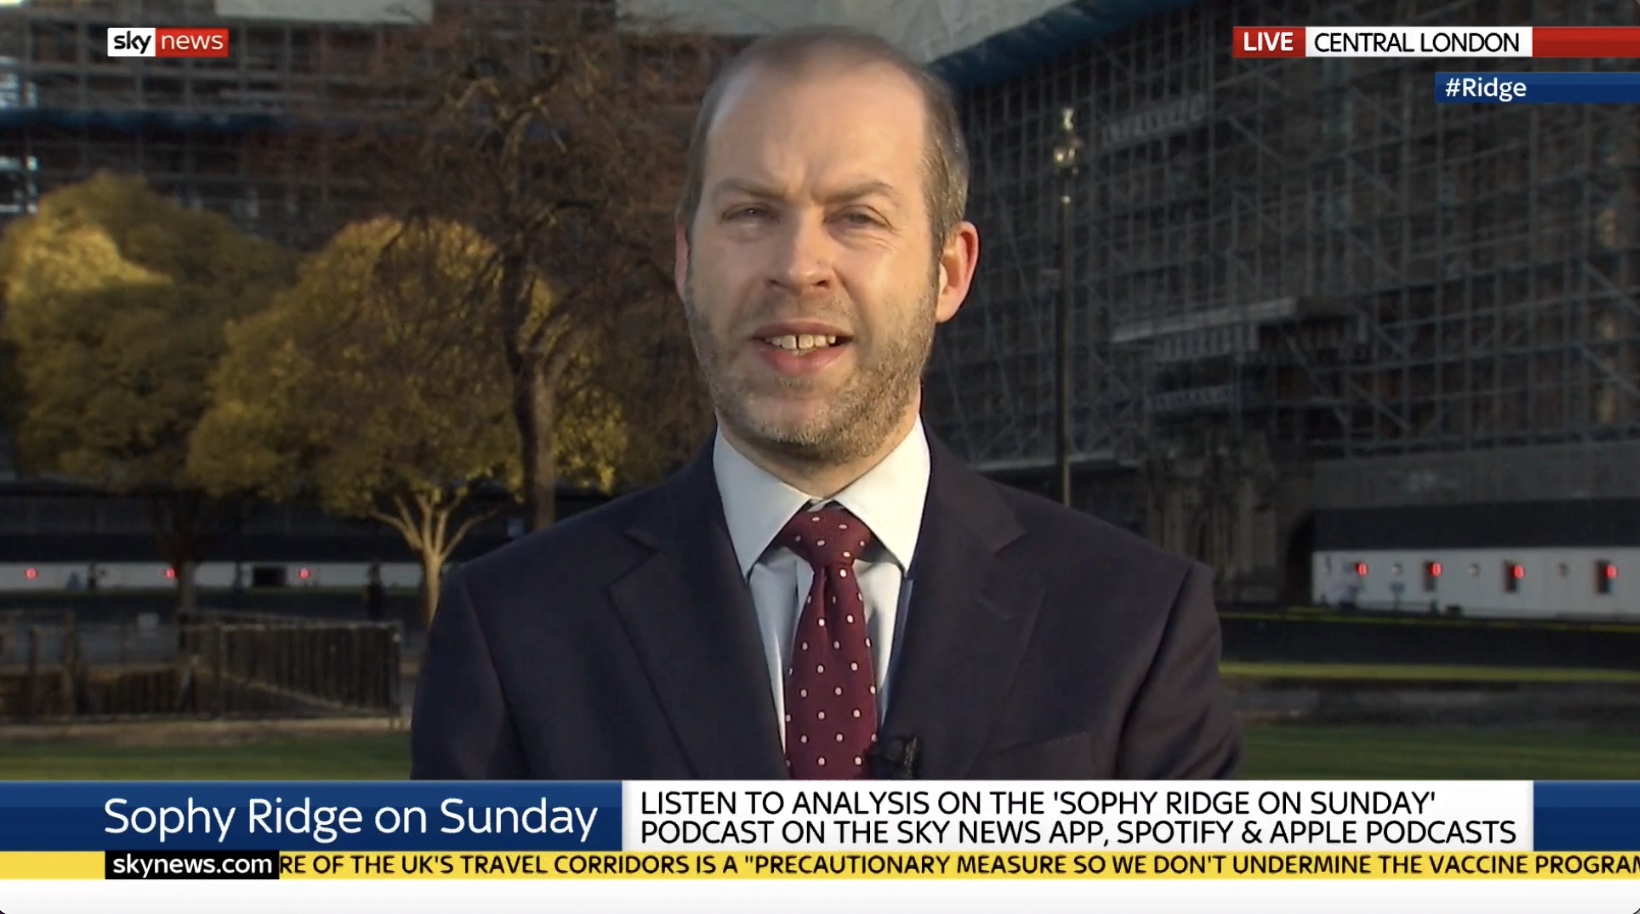 Labour: Economy Needs £6 Billion Splurge on Universal Credit